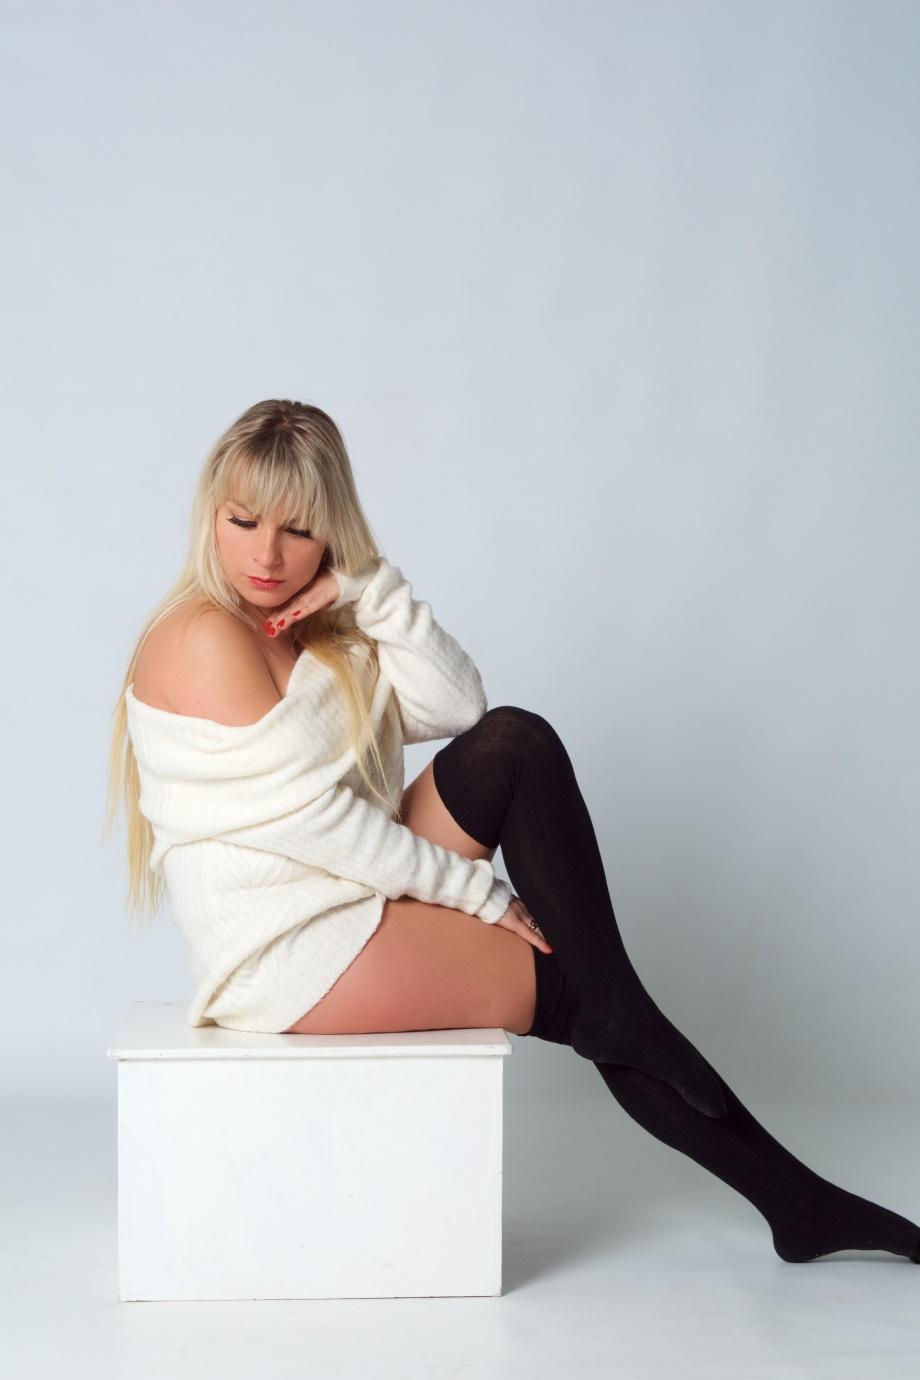 glamour, photoshoot, model, ireland, studio, cork, blonde